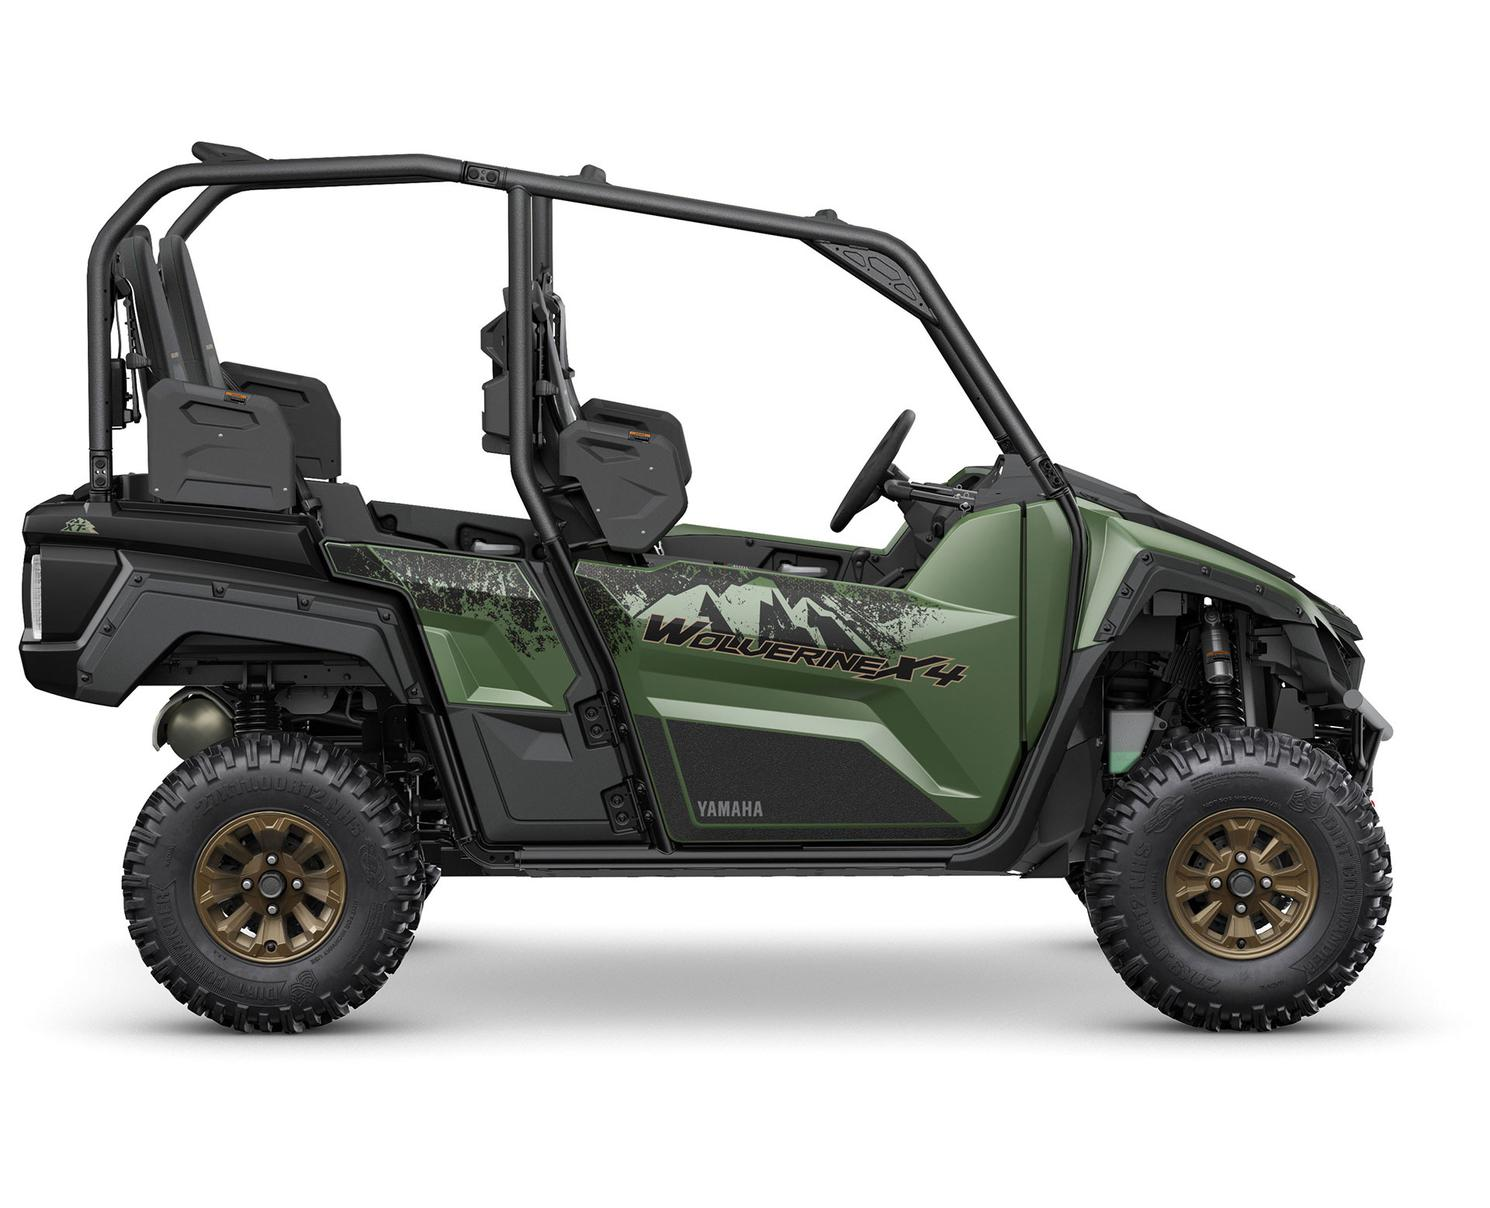 2021 Yamaha Wolverine X4 850 EPS SE Covert Green